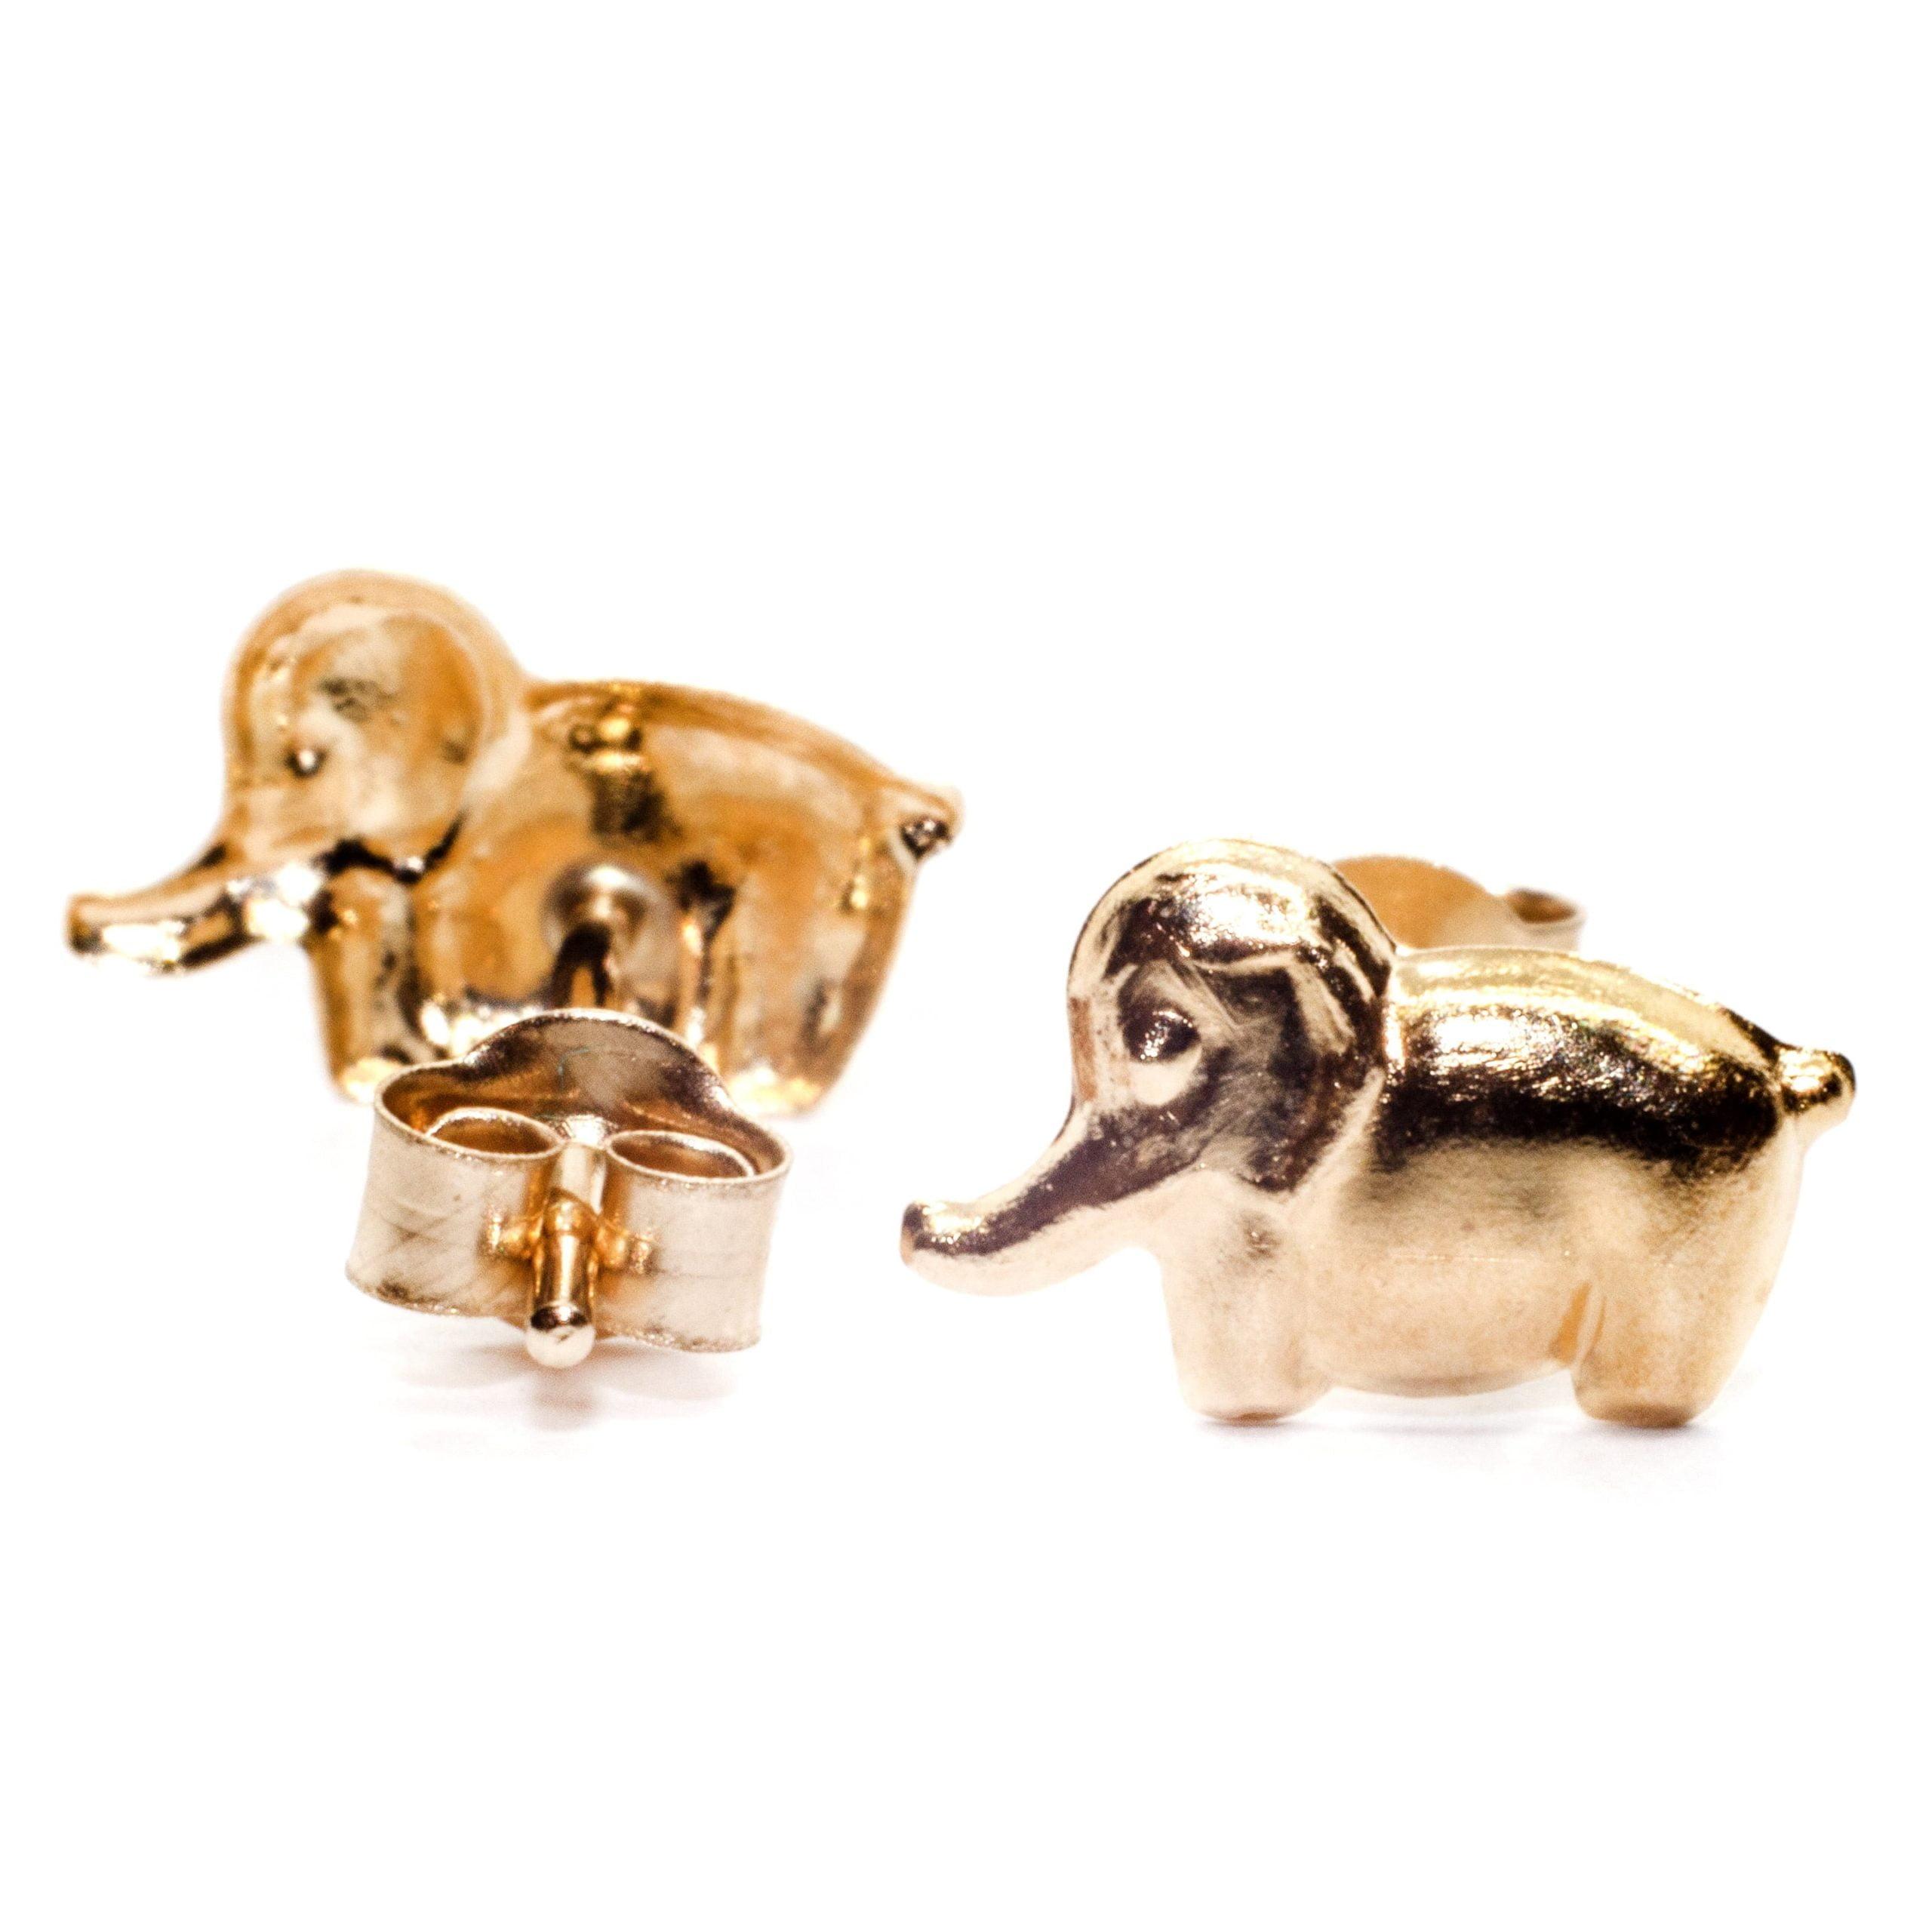 8mm elephant stud earring 9ct yellow gold (alt 2)